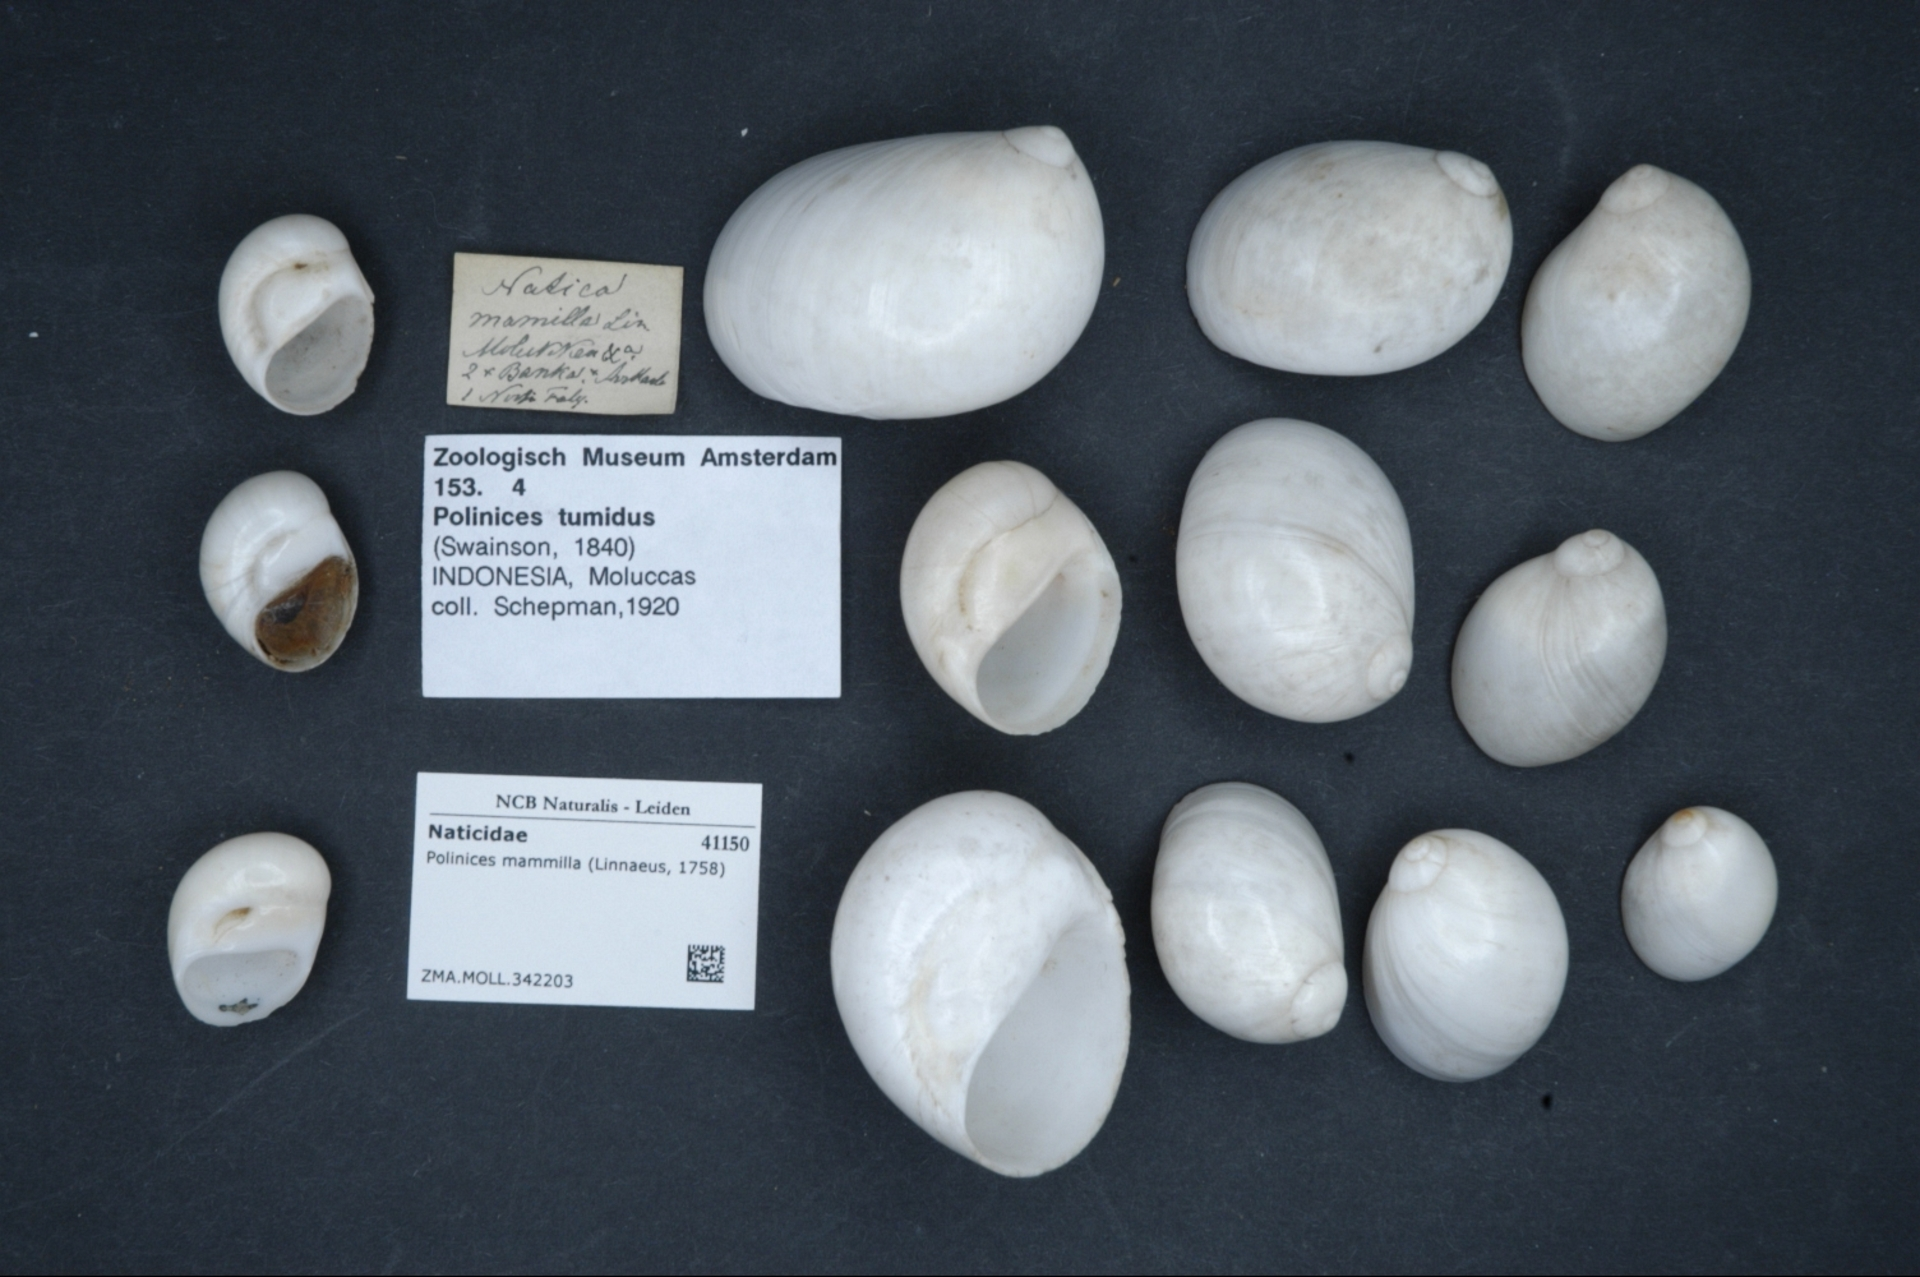 ZMA.MOLL.342203 | Polinices mammilla (Linnaeus, 1758)